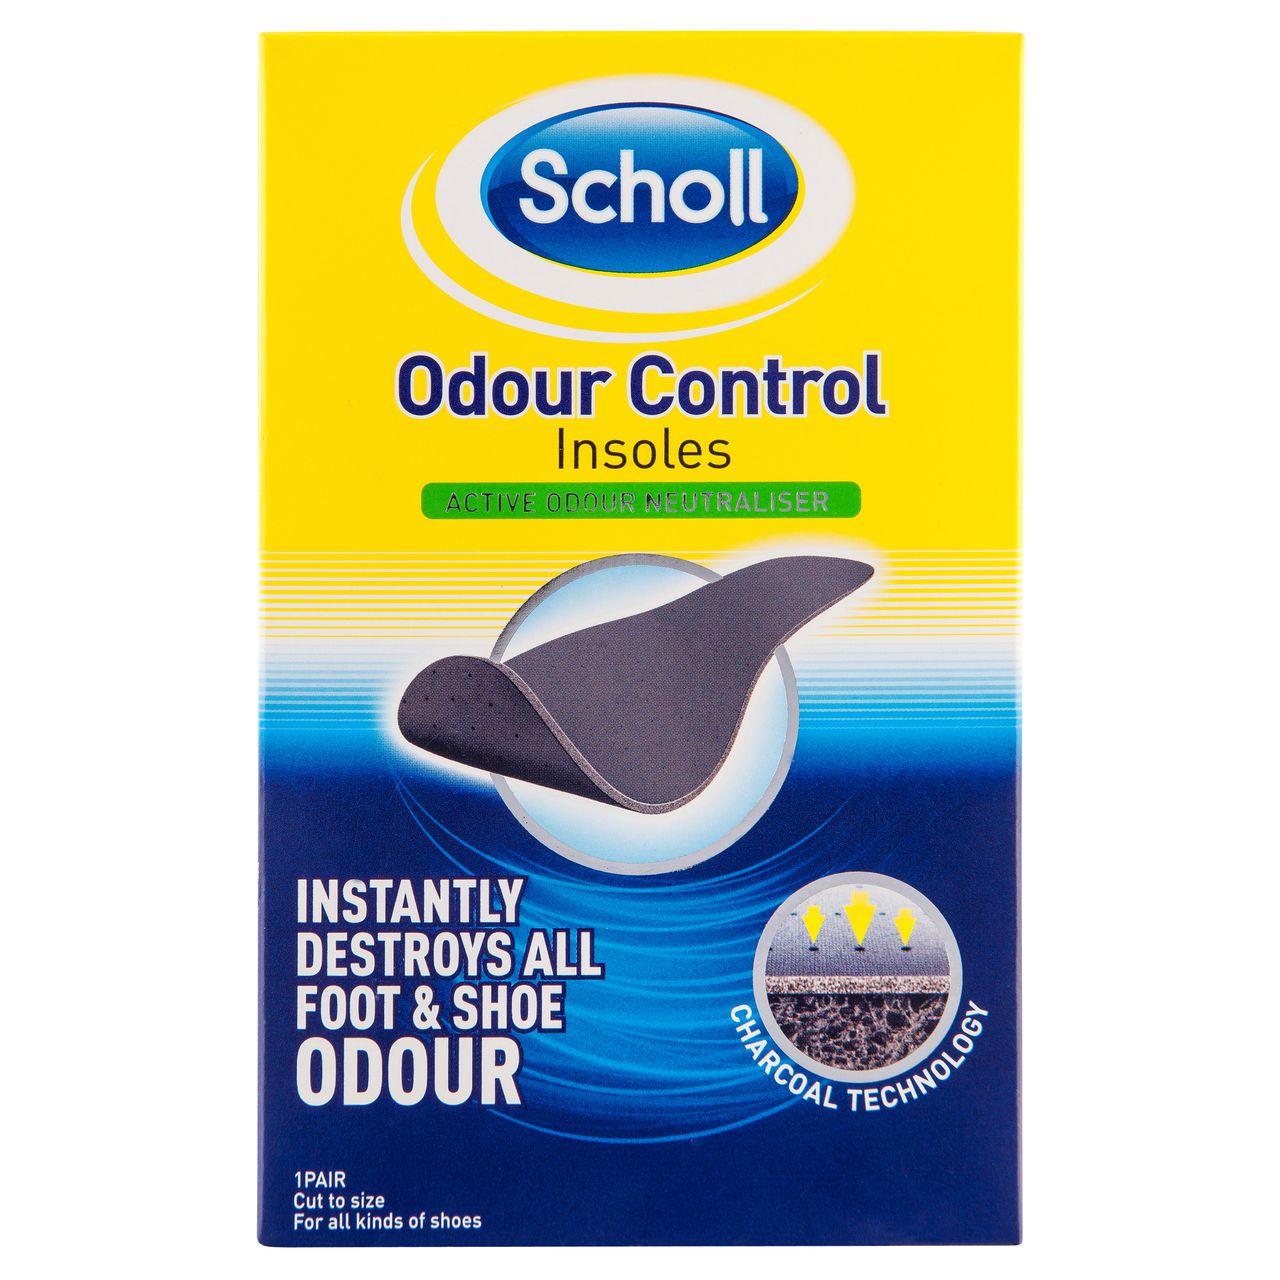 [MPLUS] SCHOLL Odour Control Insoles